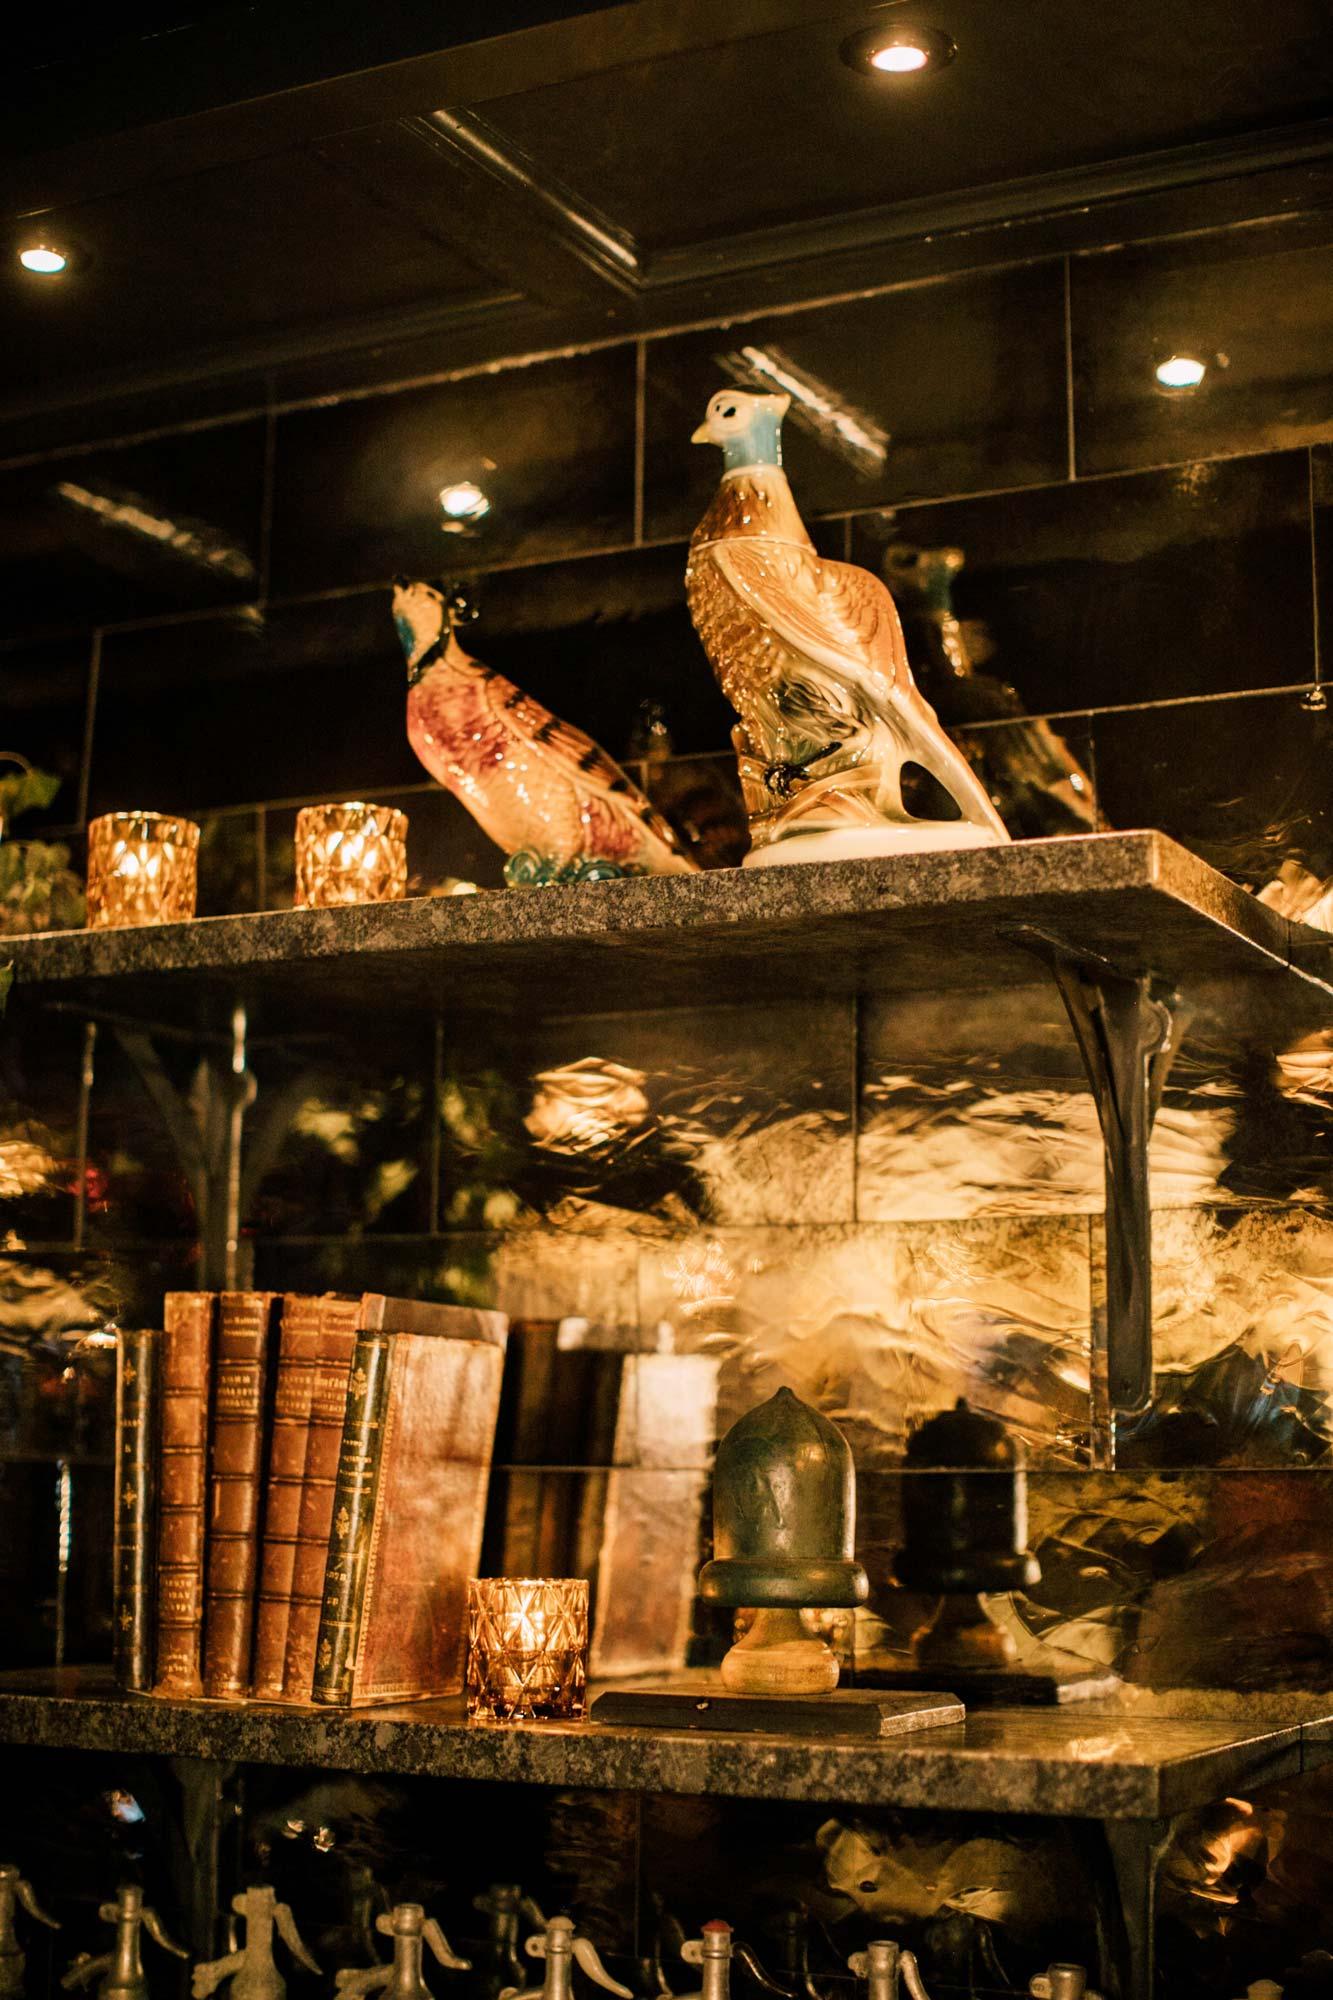 A pair of vintage porcelain pheasants perch on the back bar. Mirror tile is by Distinctive Tile & Design.